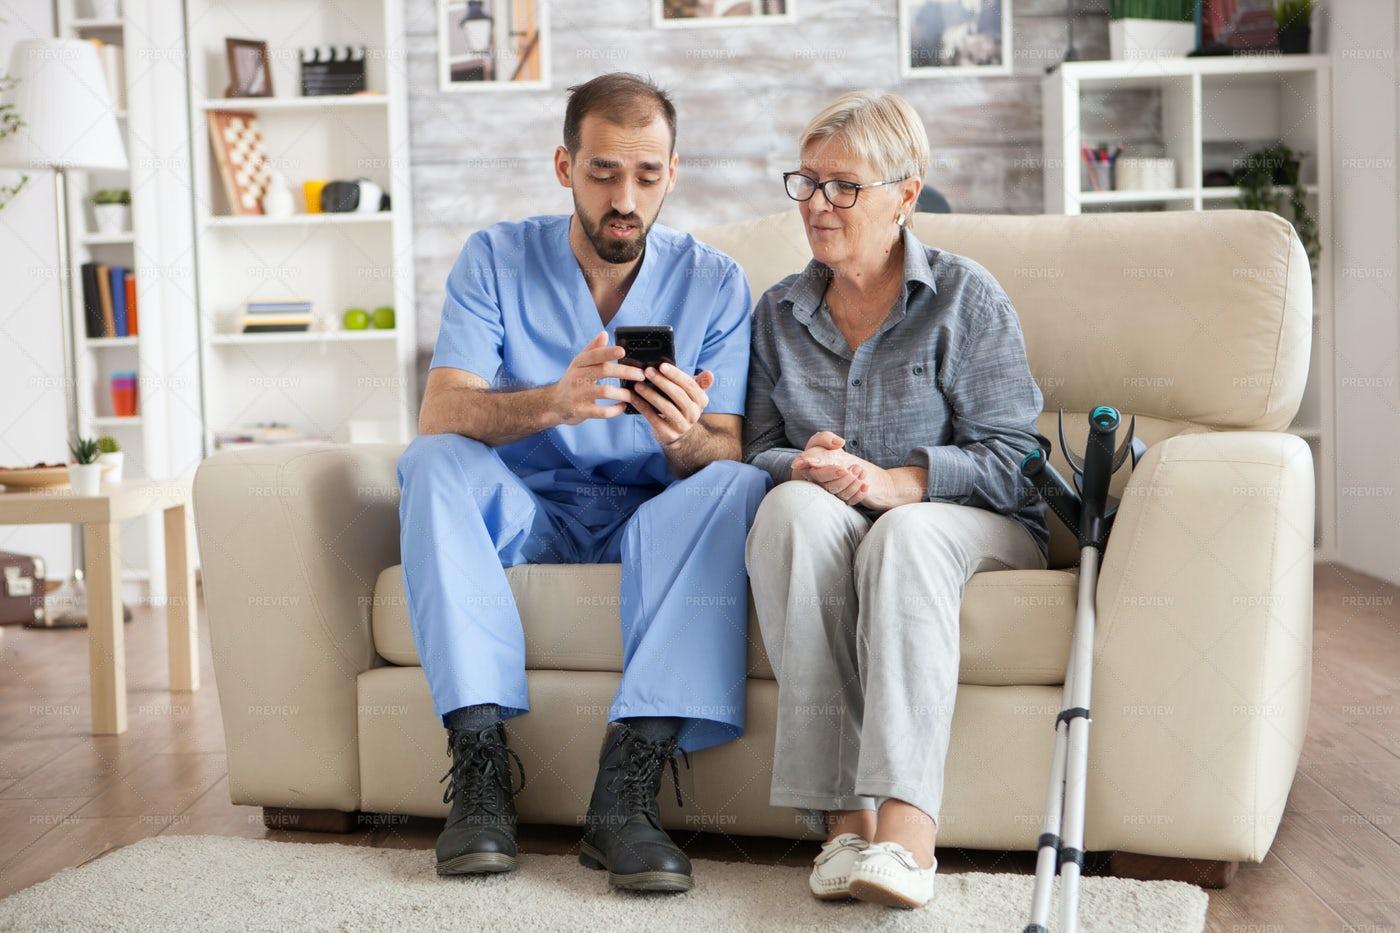 Male Nurse Sets Up Healthcare App: Stock Photos